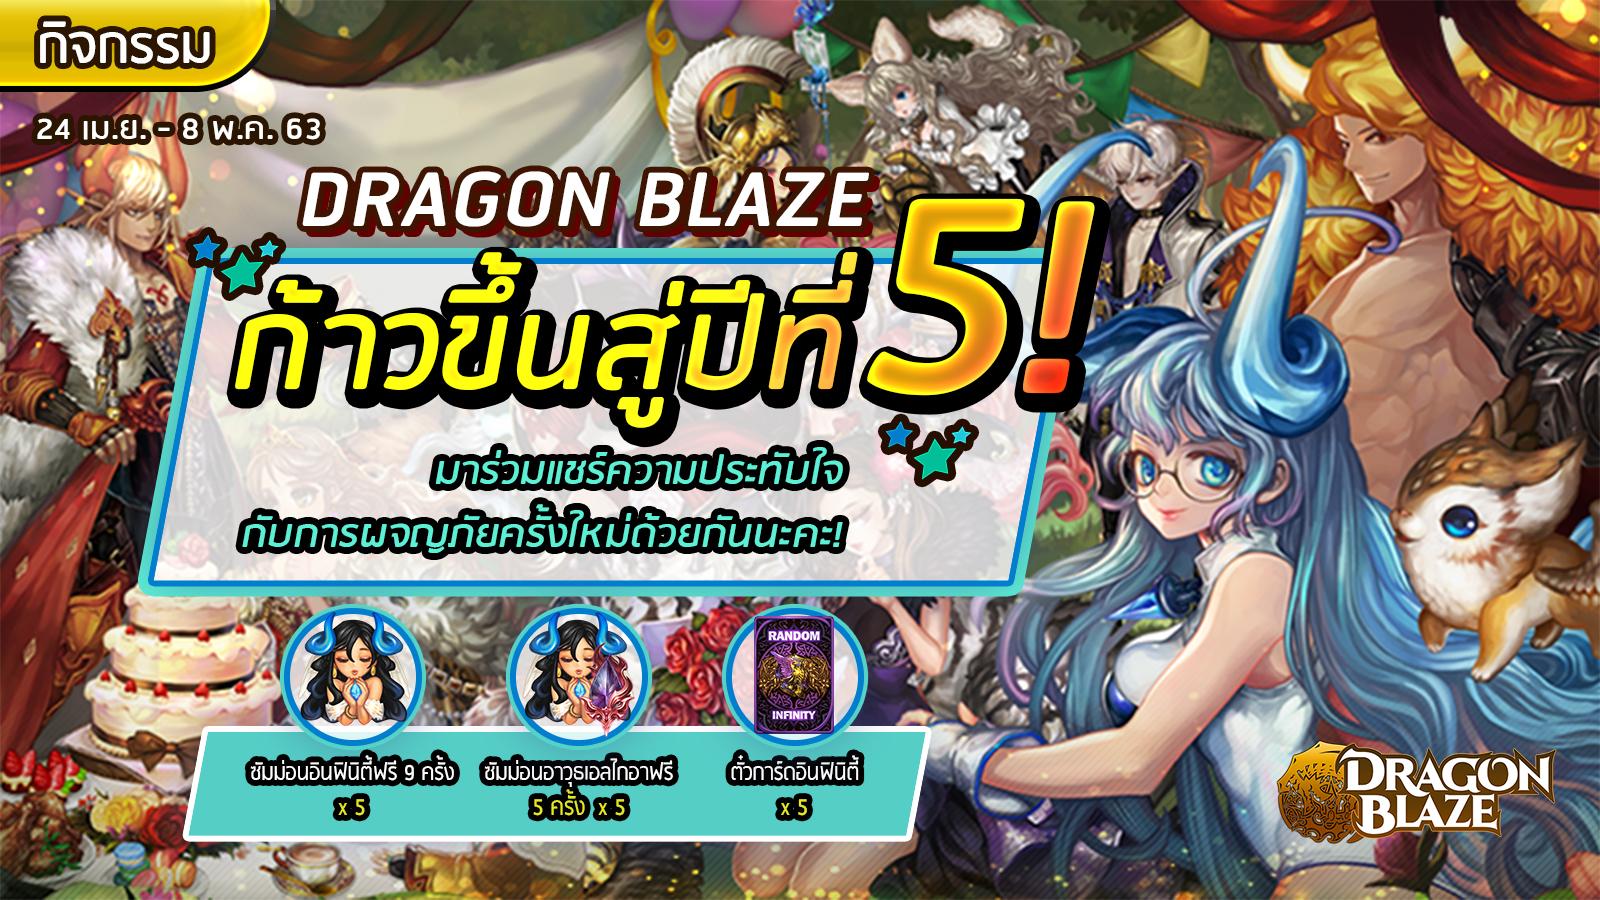 Dragon Blaze 2442020 1